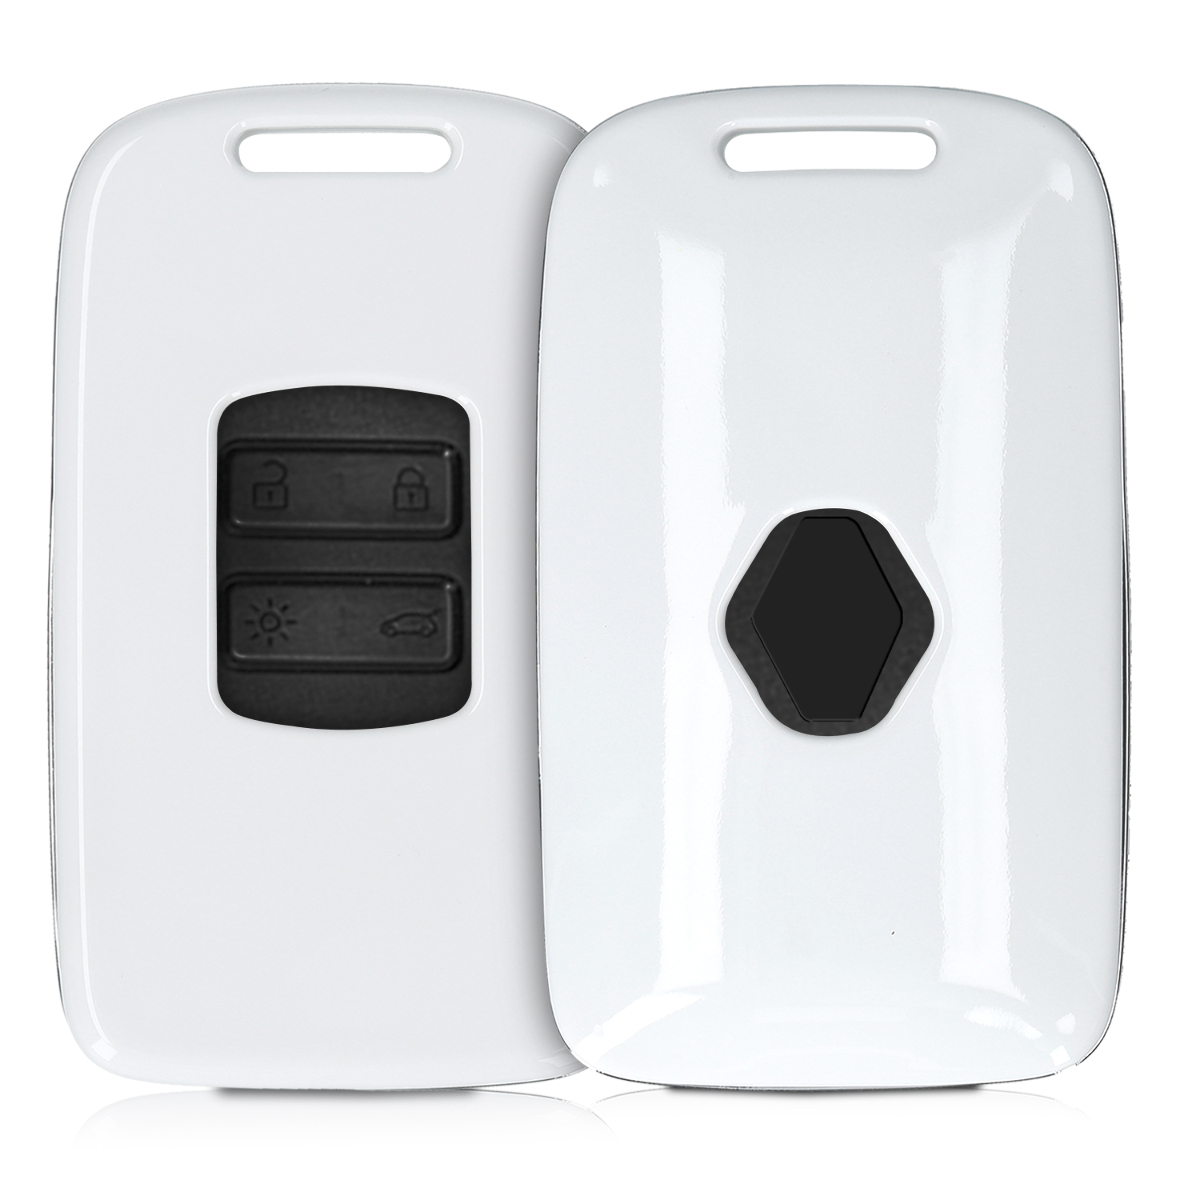 KW Σκληρή Θήκη Κλειδιού Renault - 4 Κουμπιά (Keyless Go) - White (47858.02)